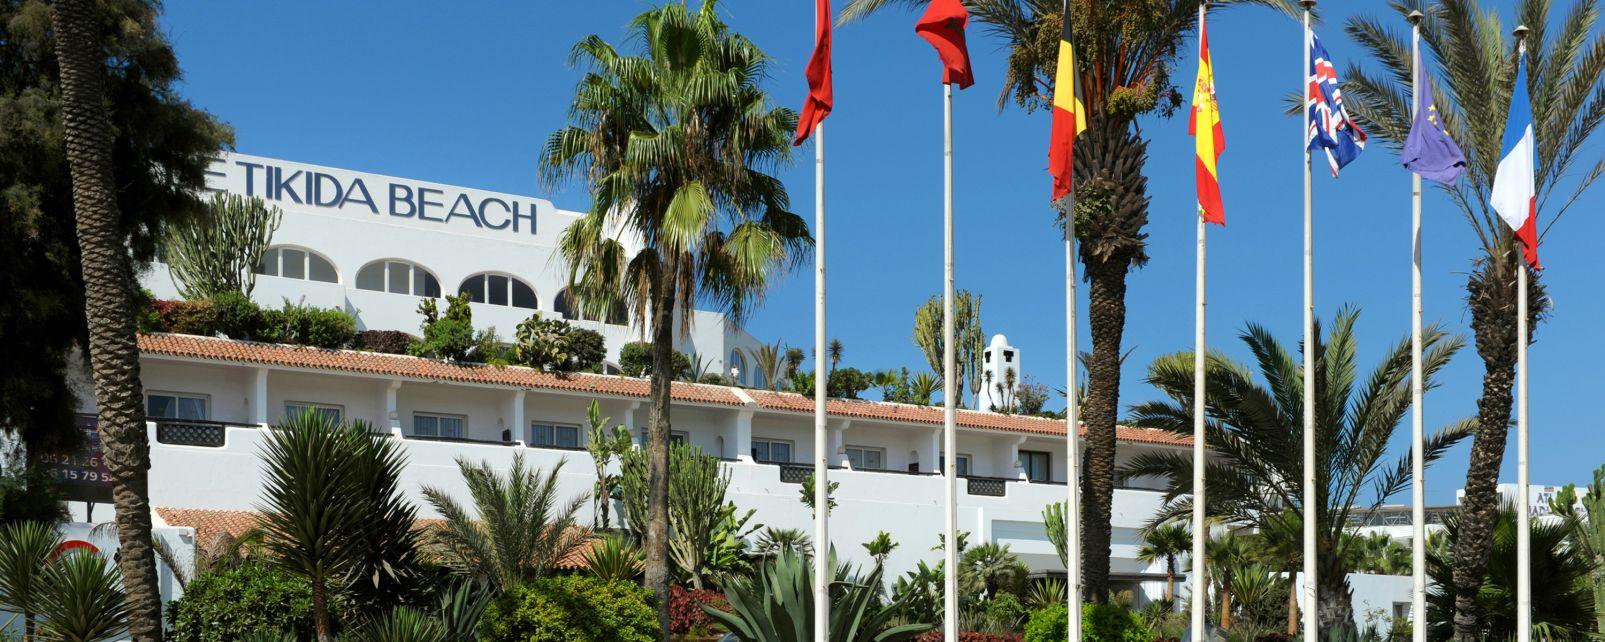 Hôtel Riu Tikida Beach